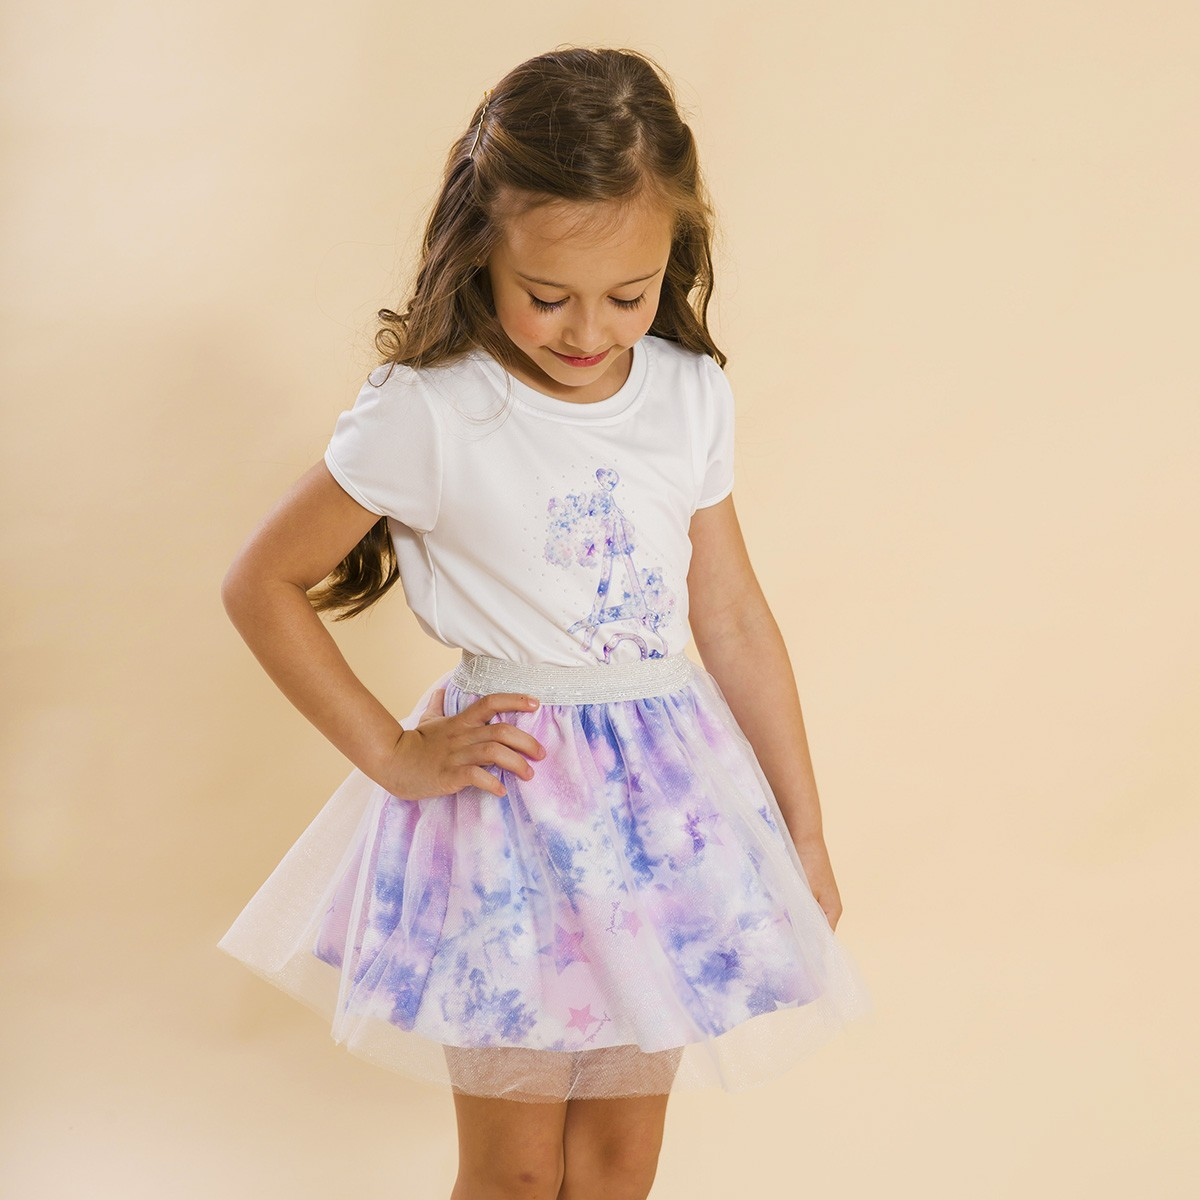 Conjunto Infantil Blusa e Saia Bailarina Tie Dye Roxo